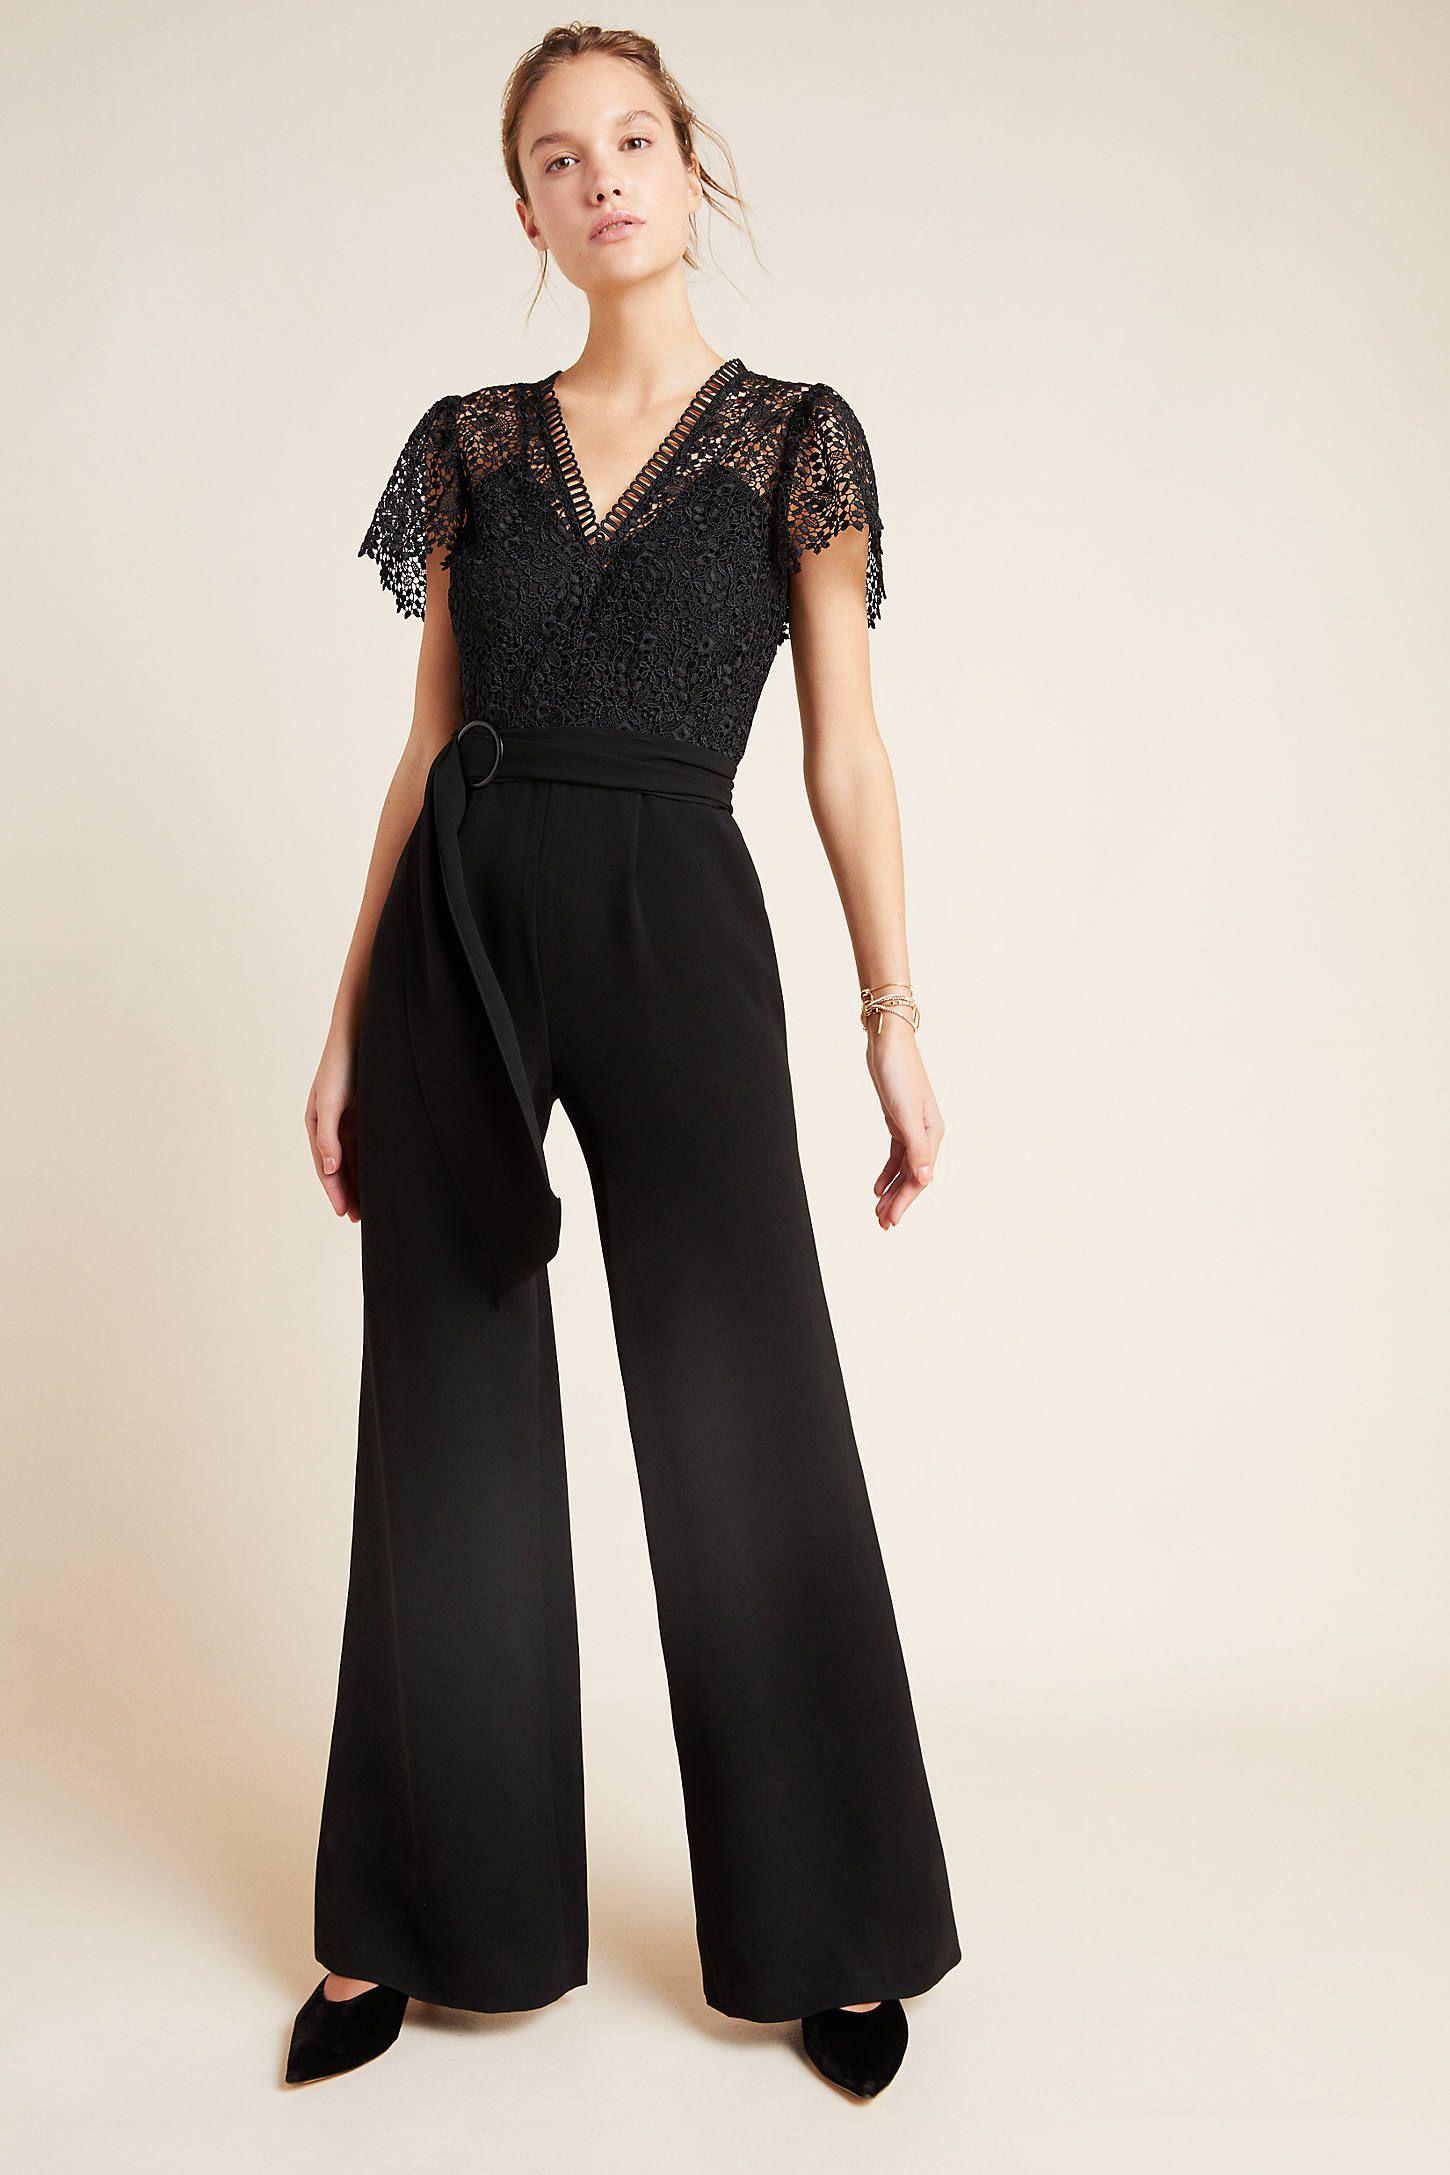 Wan-T Women Ribbed Buttons Stylish Palazzo Pants Wide Leg Romper Jumpsuits